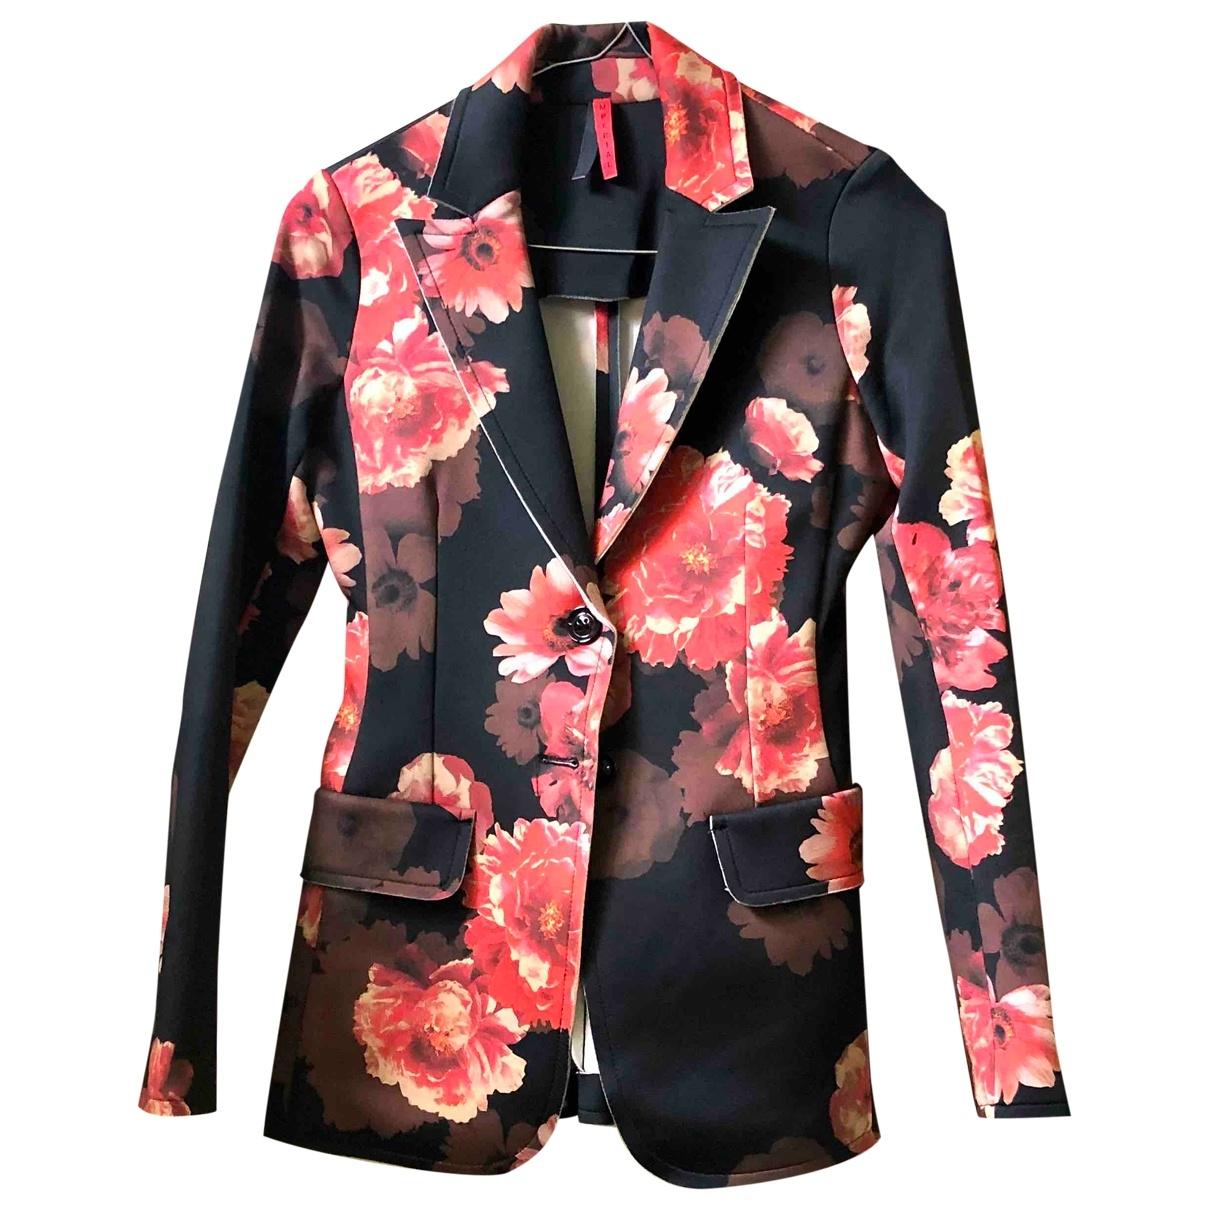 Impérial \N Black jacket for Women XS International